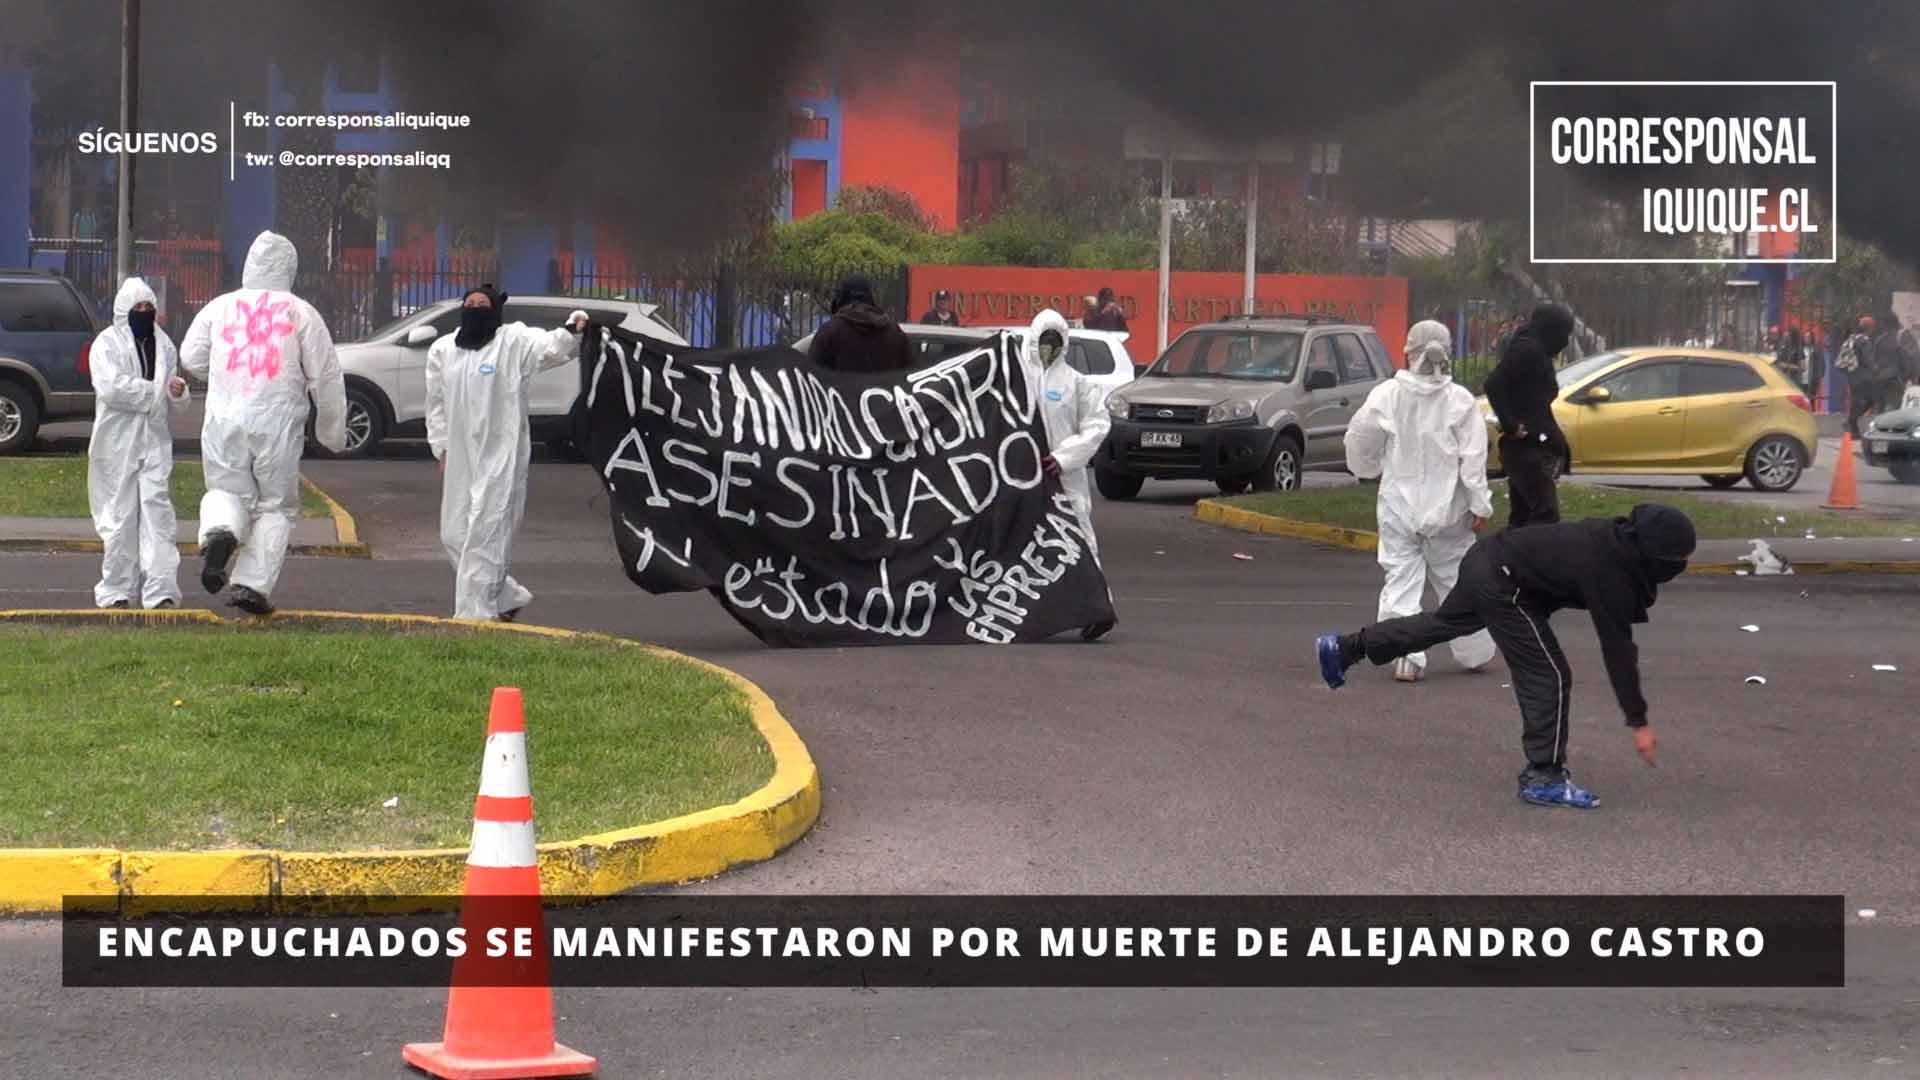 Photo of Encapuchados se manifestaron por muerte de Alejandro Castro